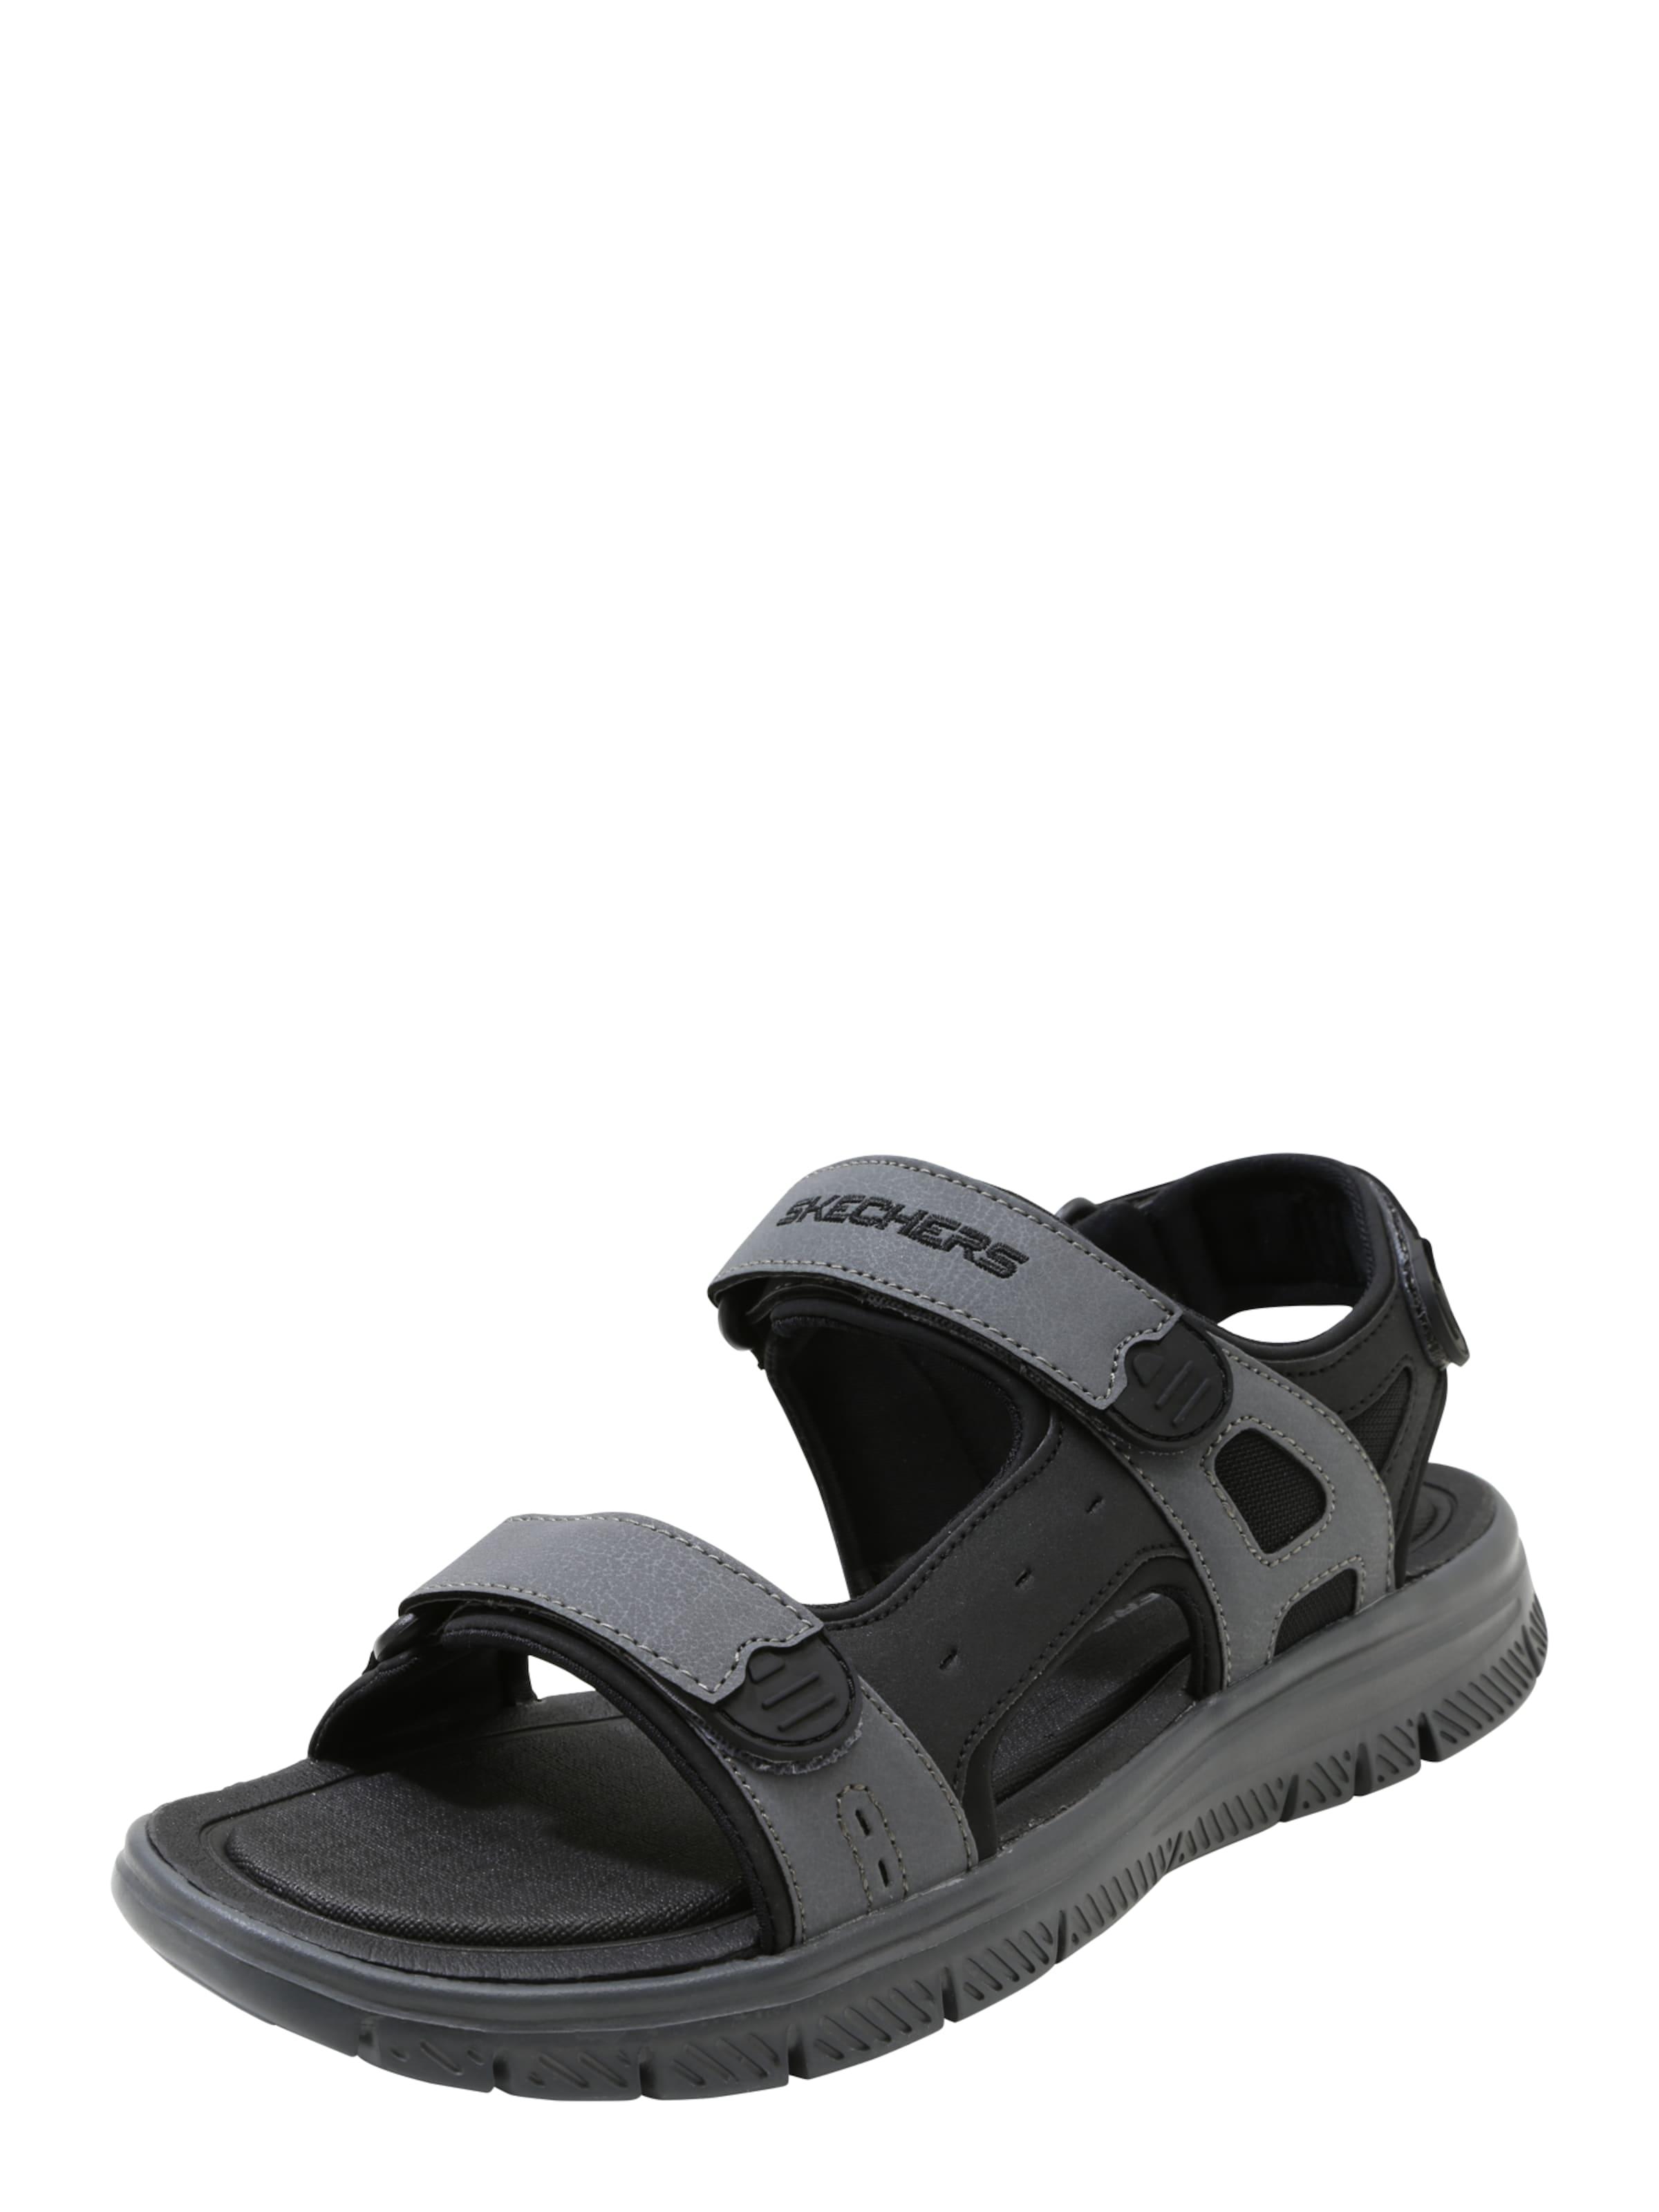 SKECHERS | Sandale mit verstellbaren Riemen